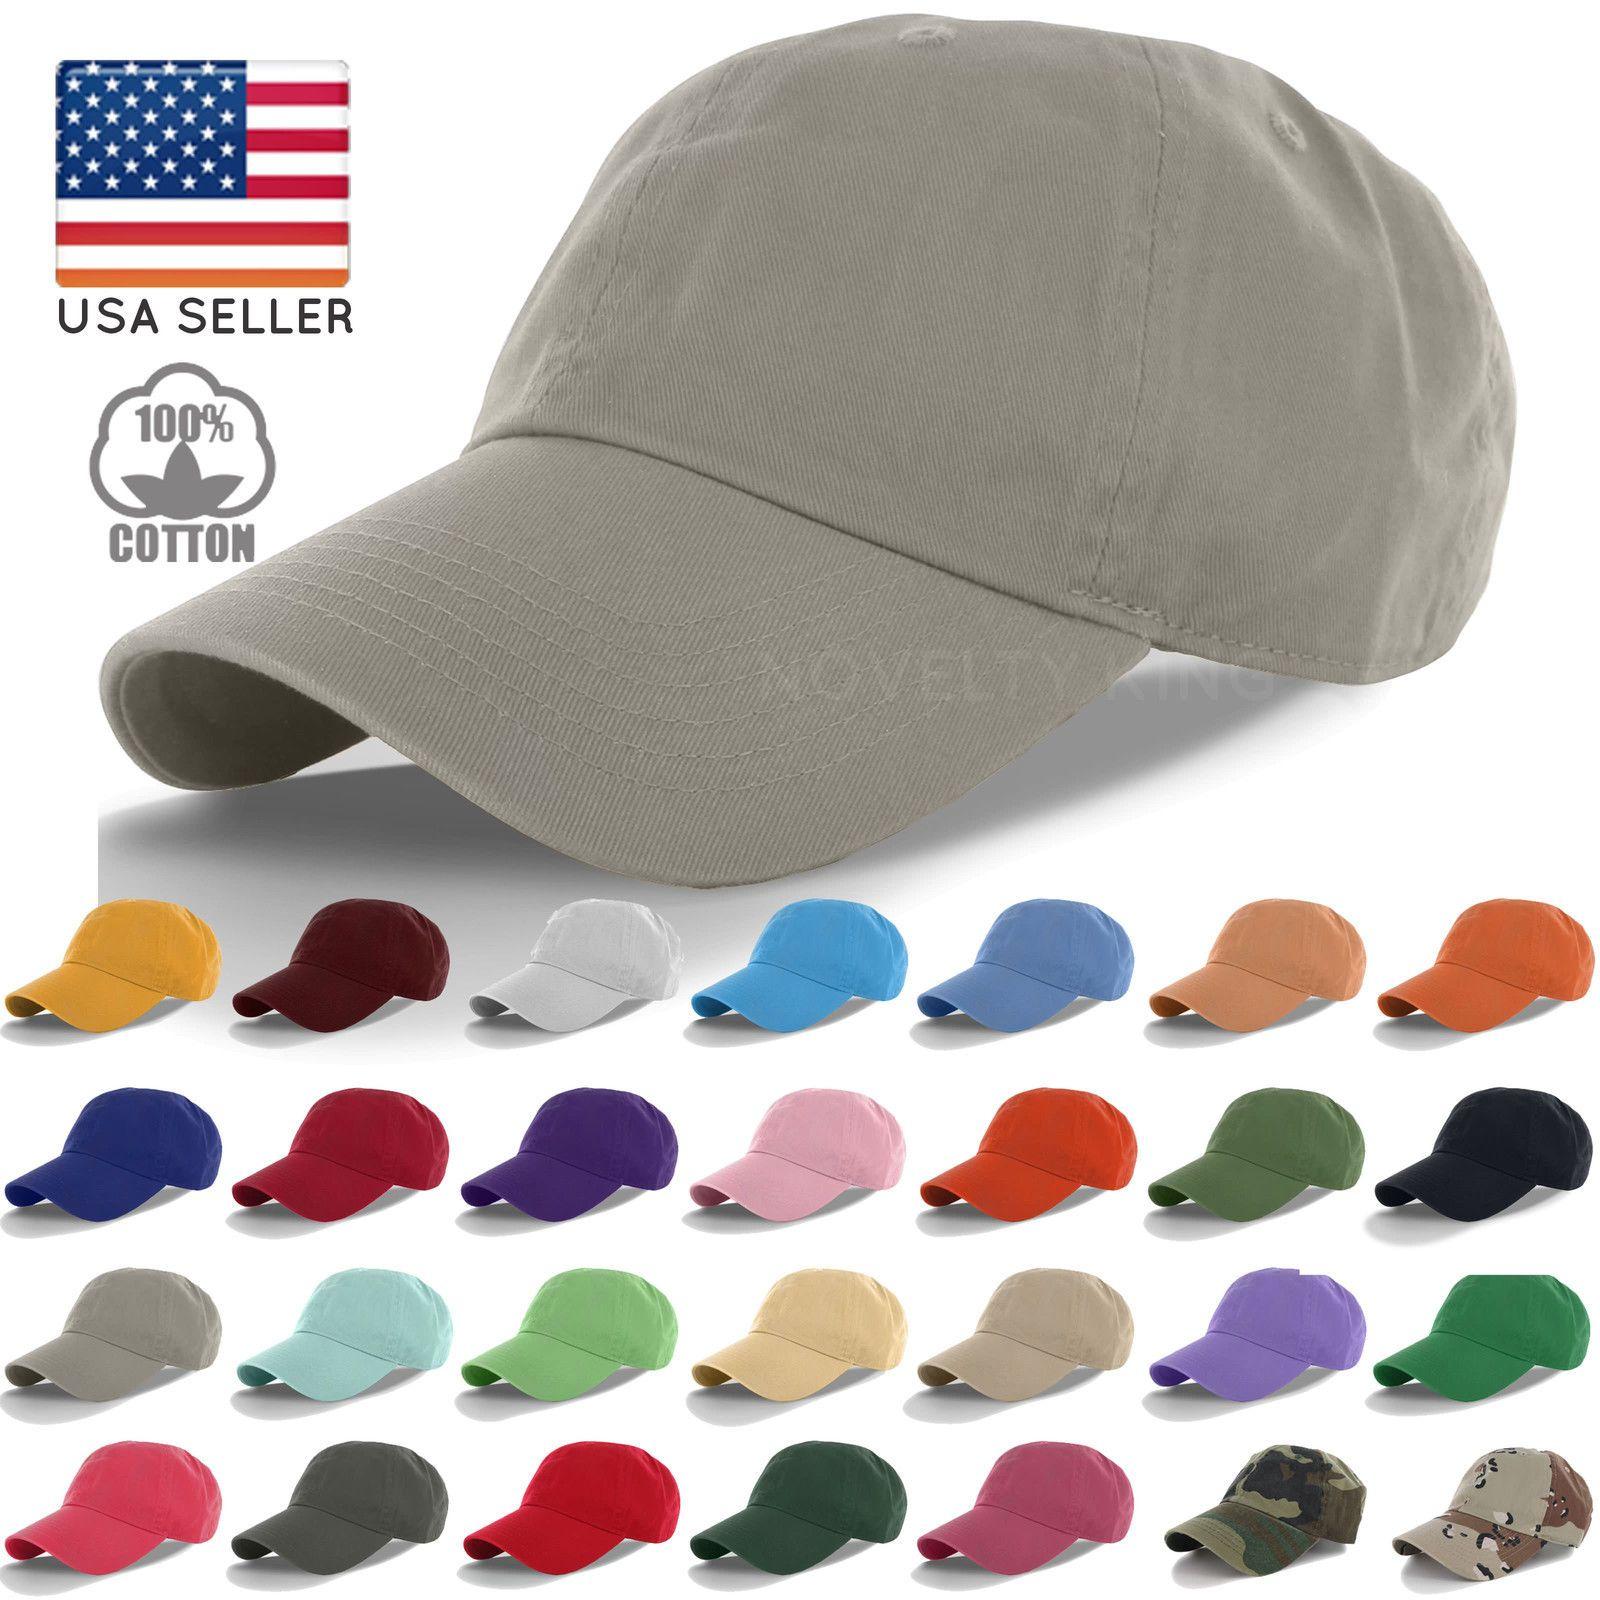 Cotton Cap Baseball Caps Hat Adjustable Polo Style Washed Plain Solid Visor bcbeca6c50ad